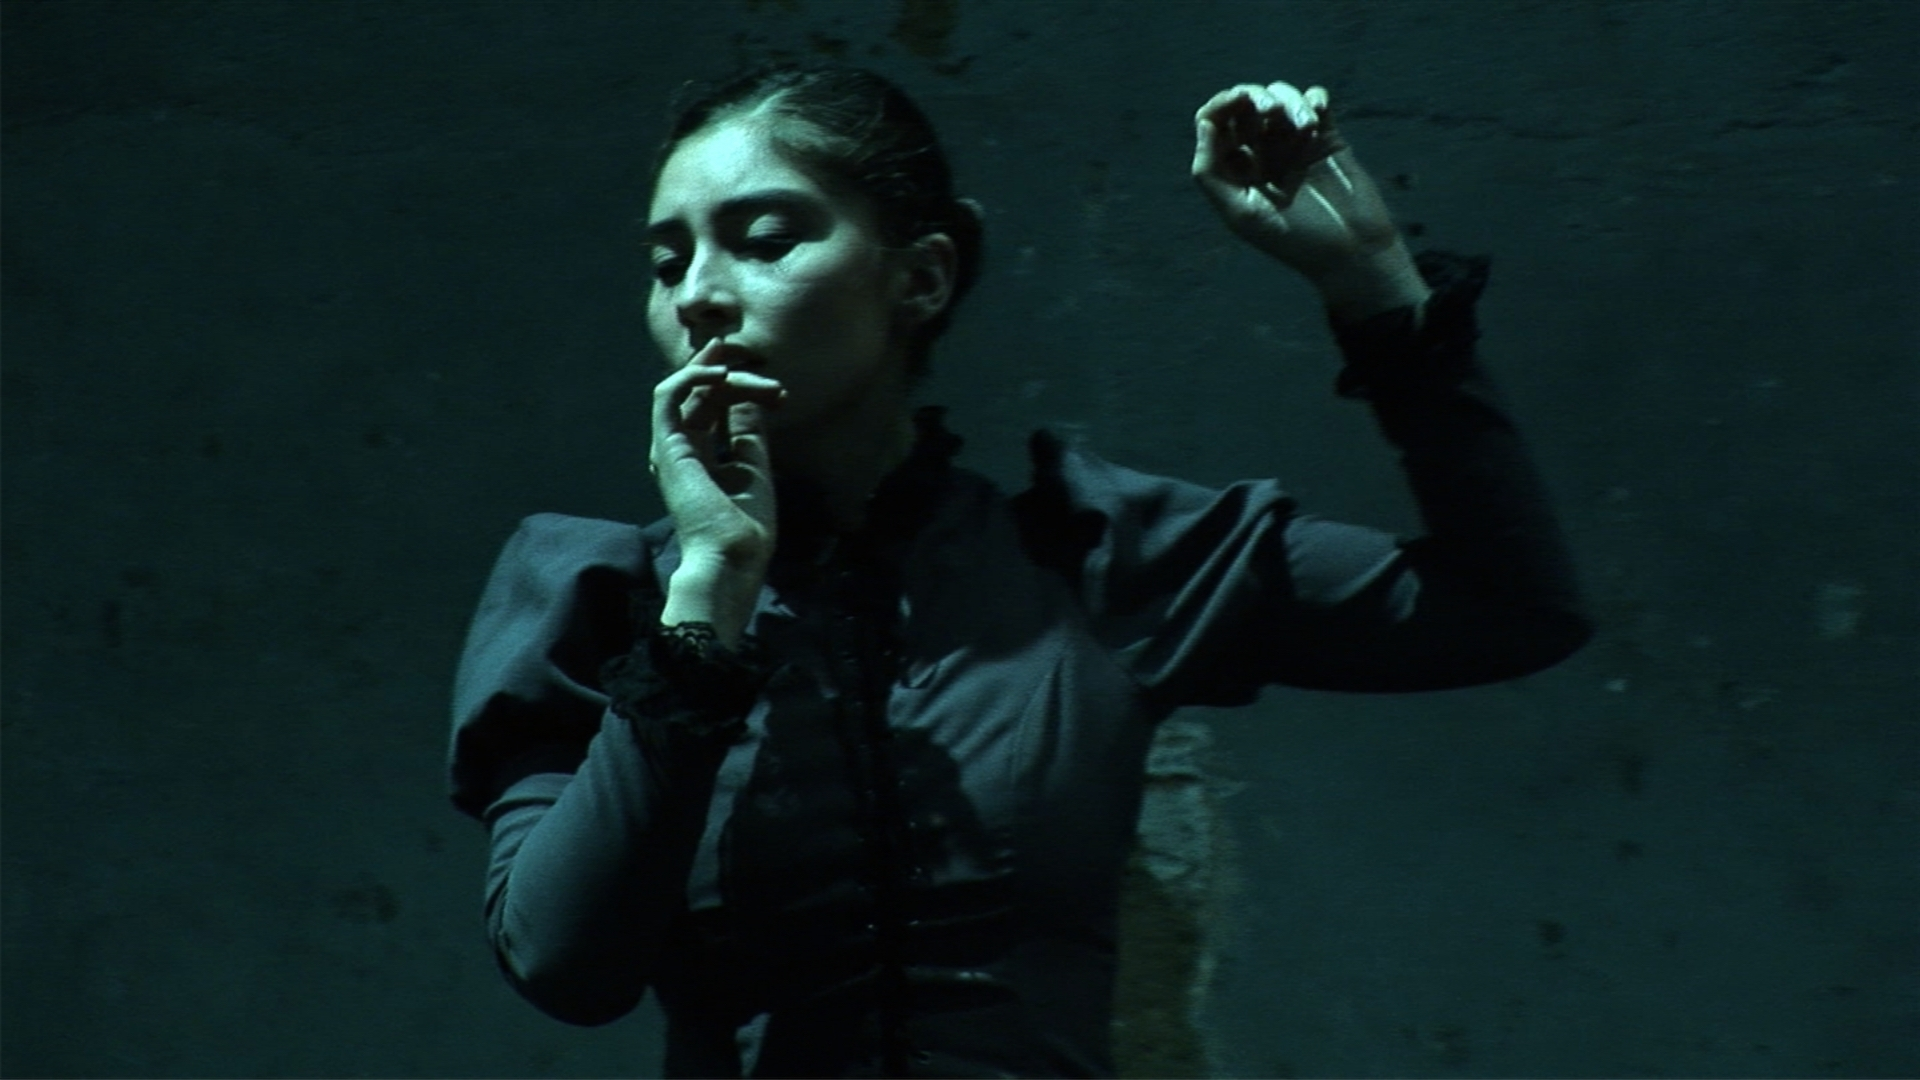 © Zikzira Physical Theatre, Eu vos Liberto, Macarena Campbell, Brazil, 2008, 2 Photo Andre Semenza .jpg